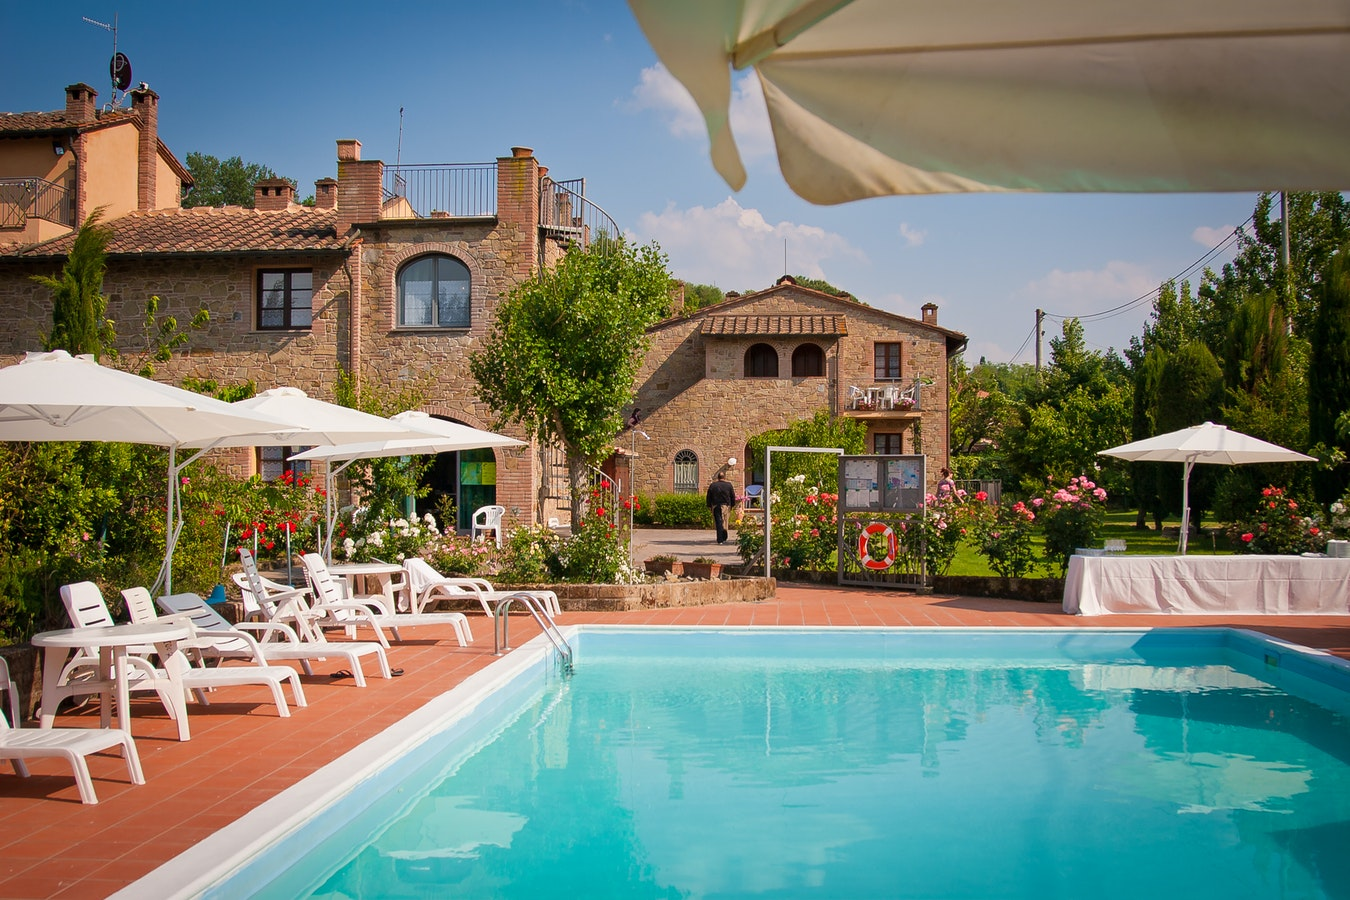 Ristoranti Matrimonio Toscana : Residence santa maria montaione agriturismo con